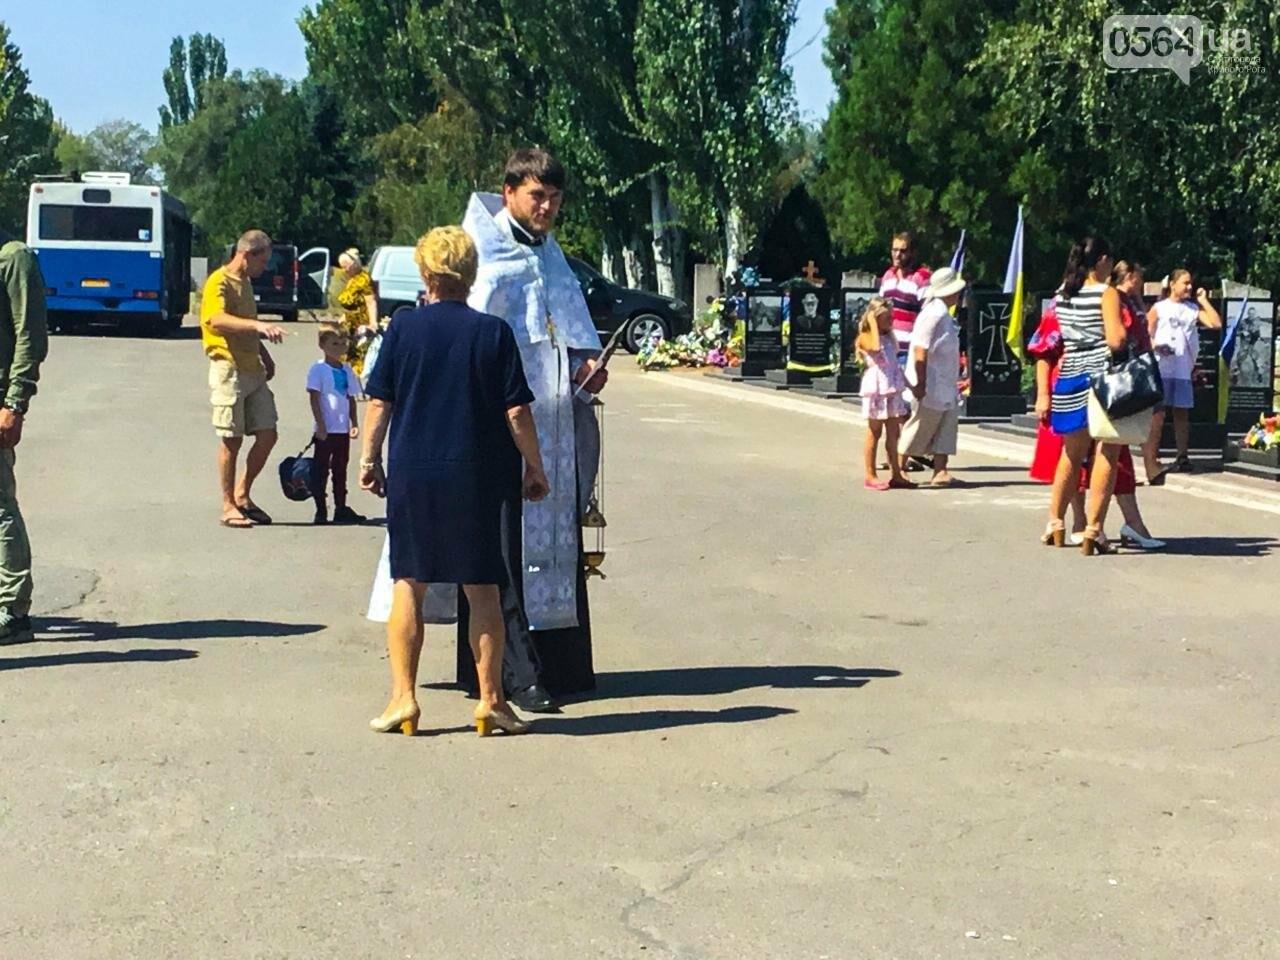 На Аллее Героев провели панихиду по погибшим в зоне АТО криворожанам, - ФОТО , фото-6